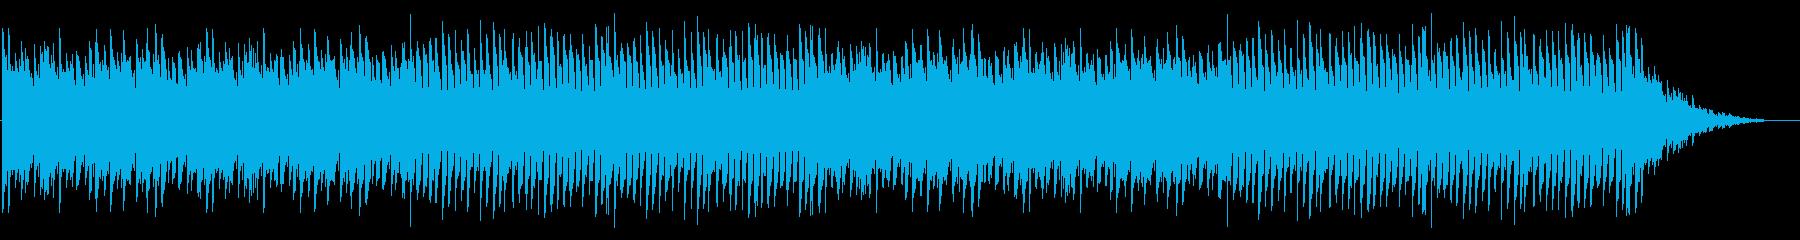 NES アクションD07-1(ボス) の再生済みの波形